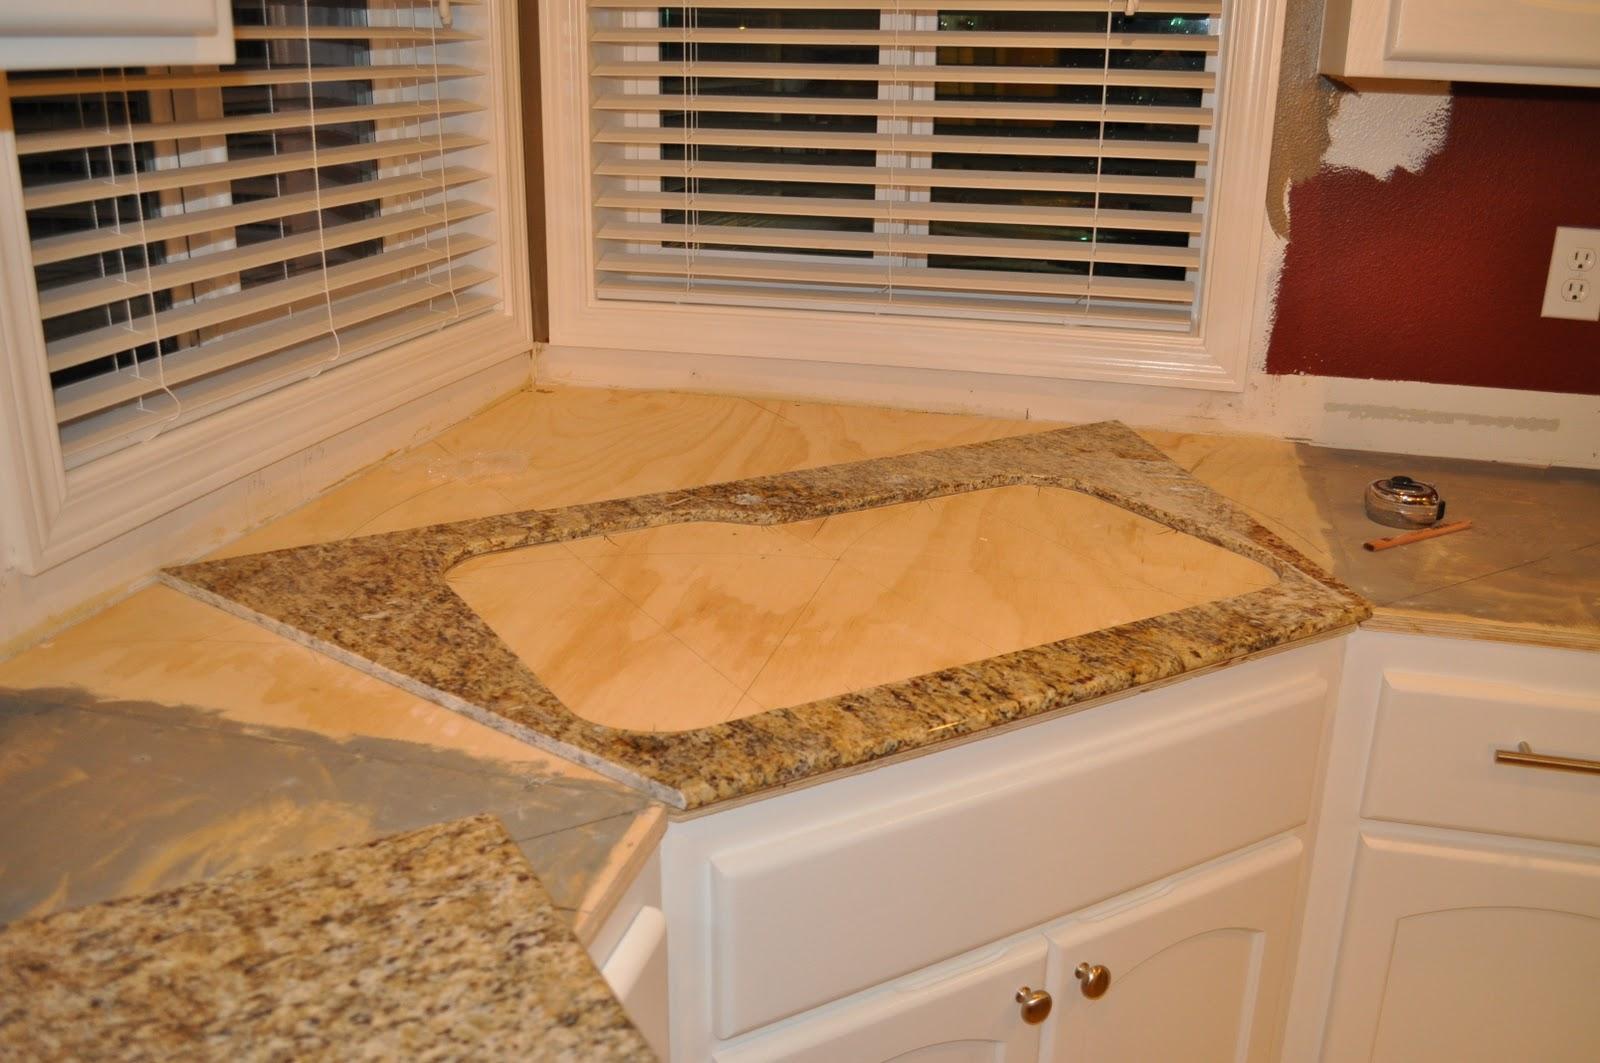 backsplash tiles pin countertop designs black tile countertops subway for kitchen granite